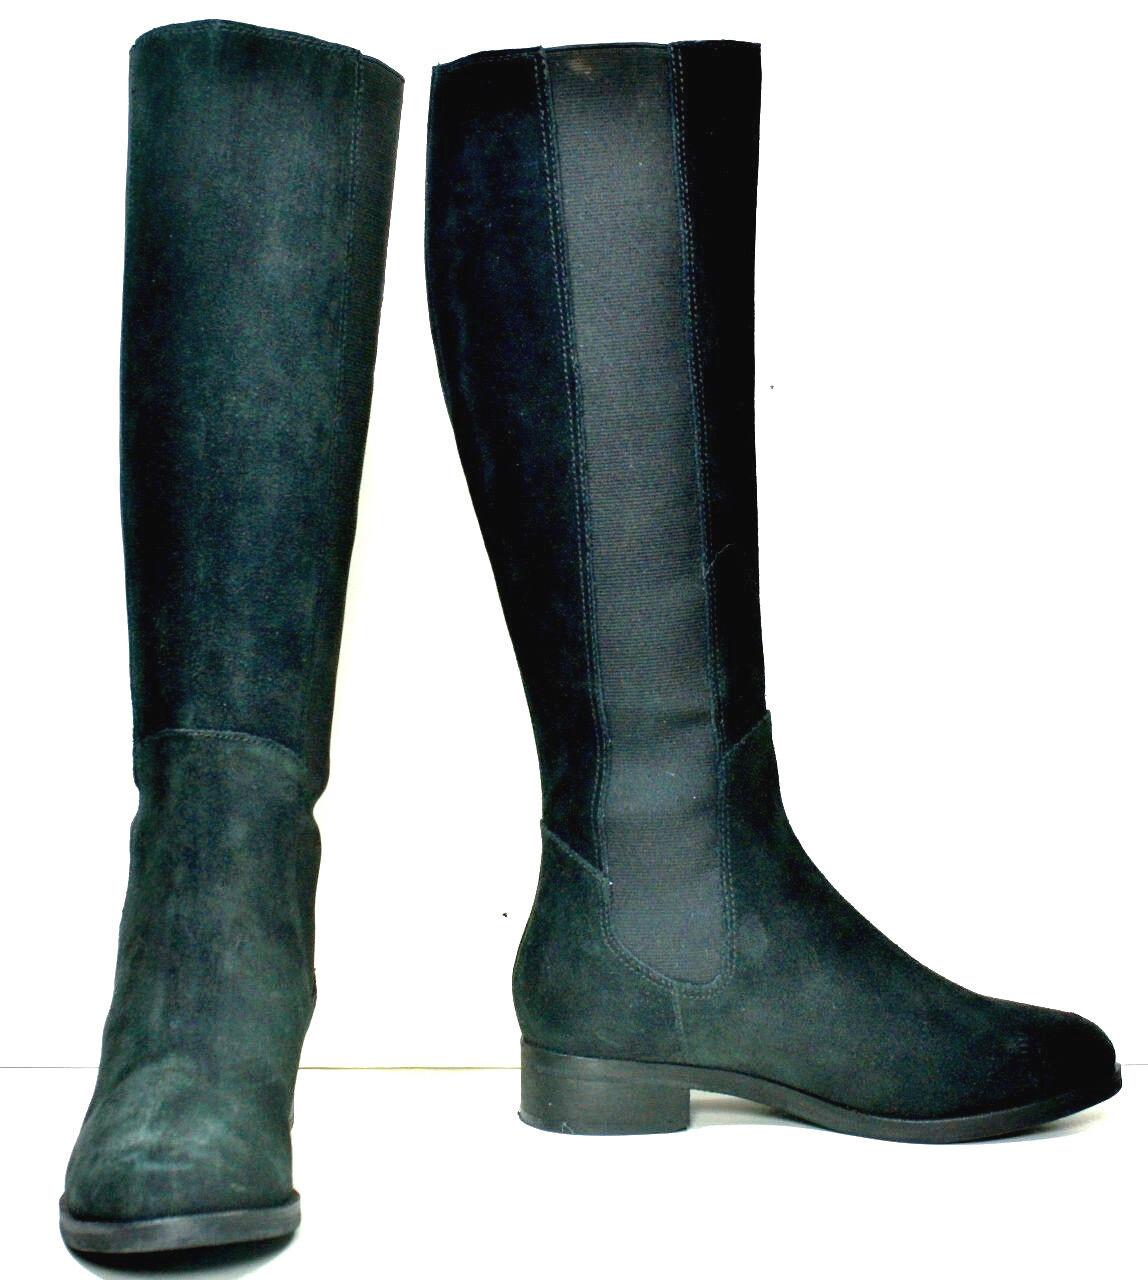 Cole Haan Mujer botas Tamaño 5.5 B Negro Gamuza Gamuza Gamuza Montar Rodilla Alta (20)  nueva marca